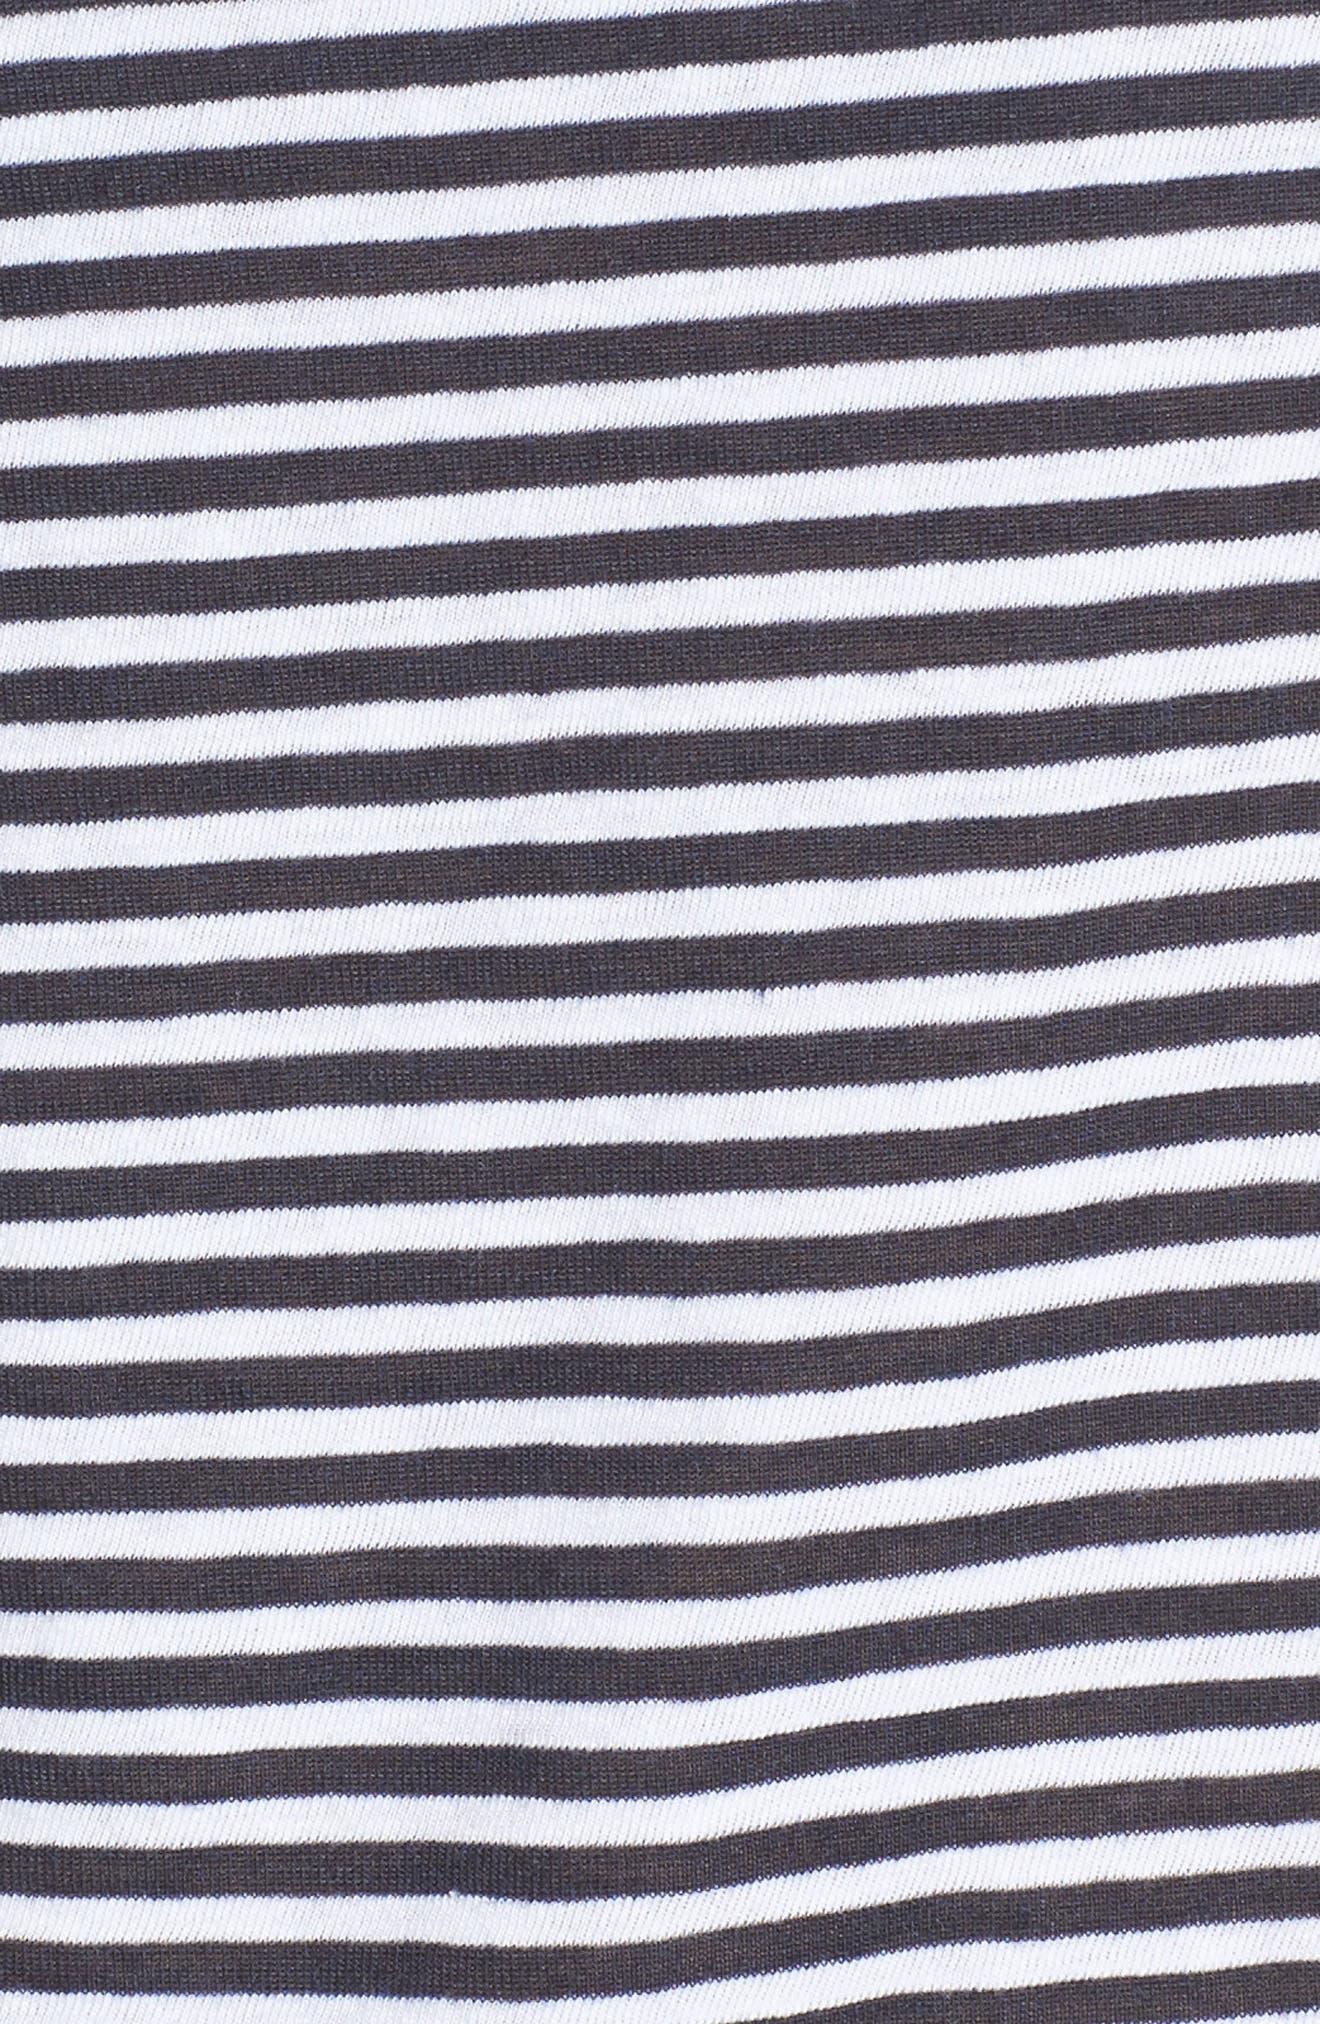 Lips Appliqué Stripe Tee,                             Alternate thumbnail 5, color,                             490